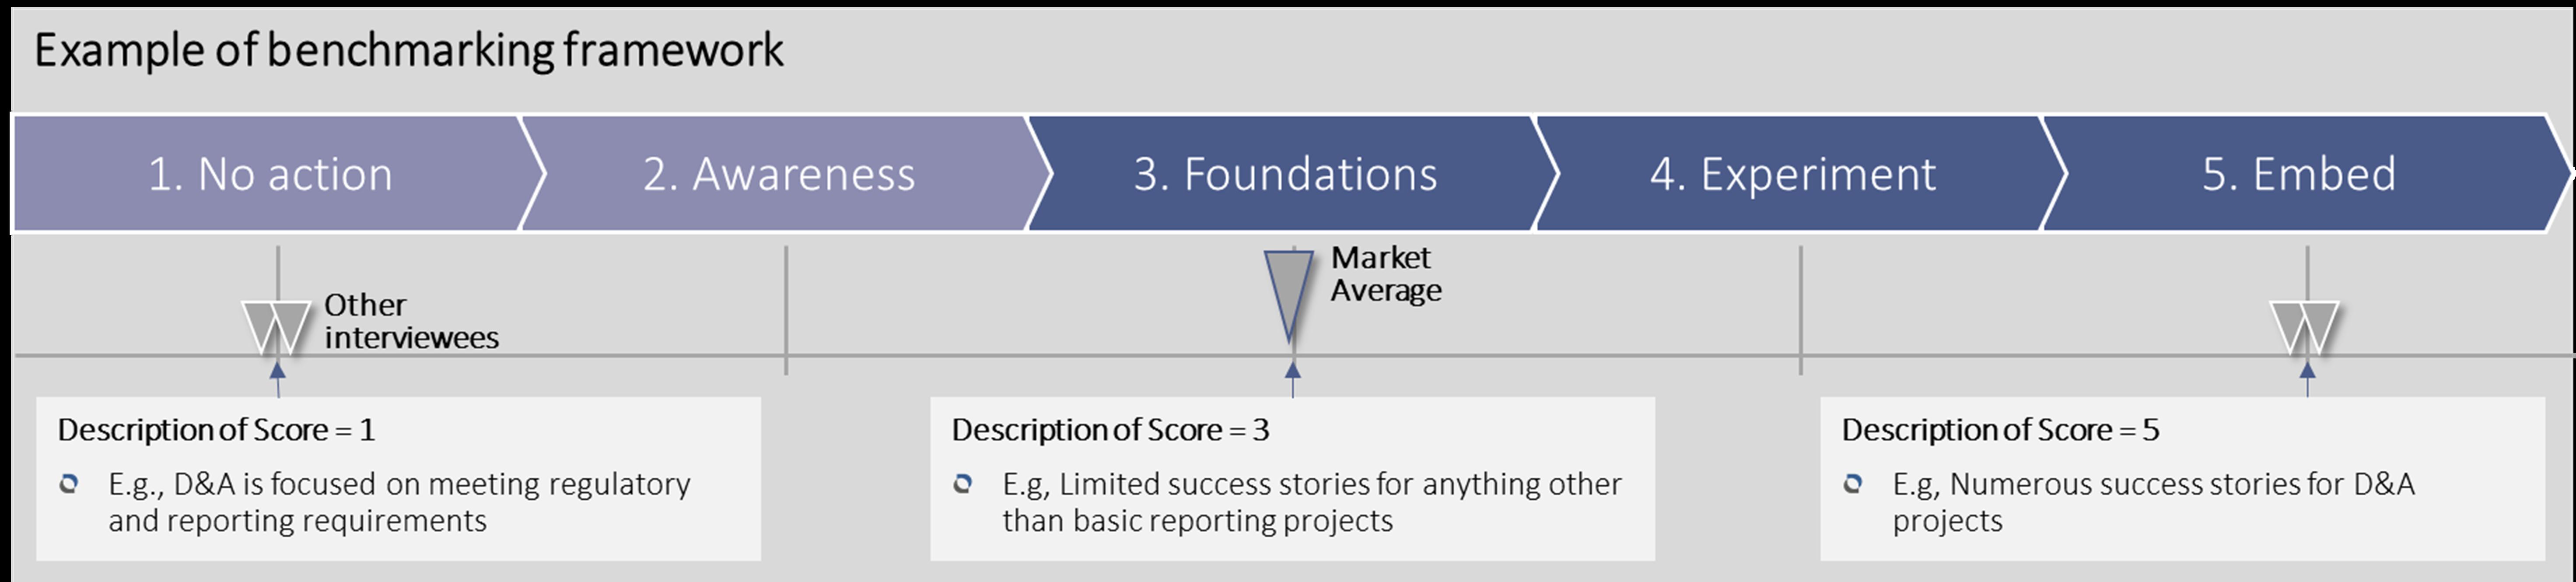 Example of Data & Analytics benchmarking framework